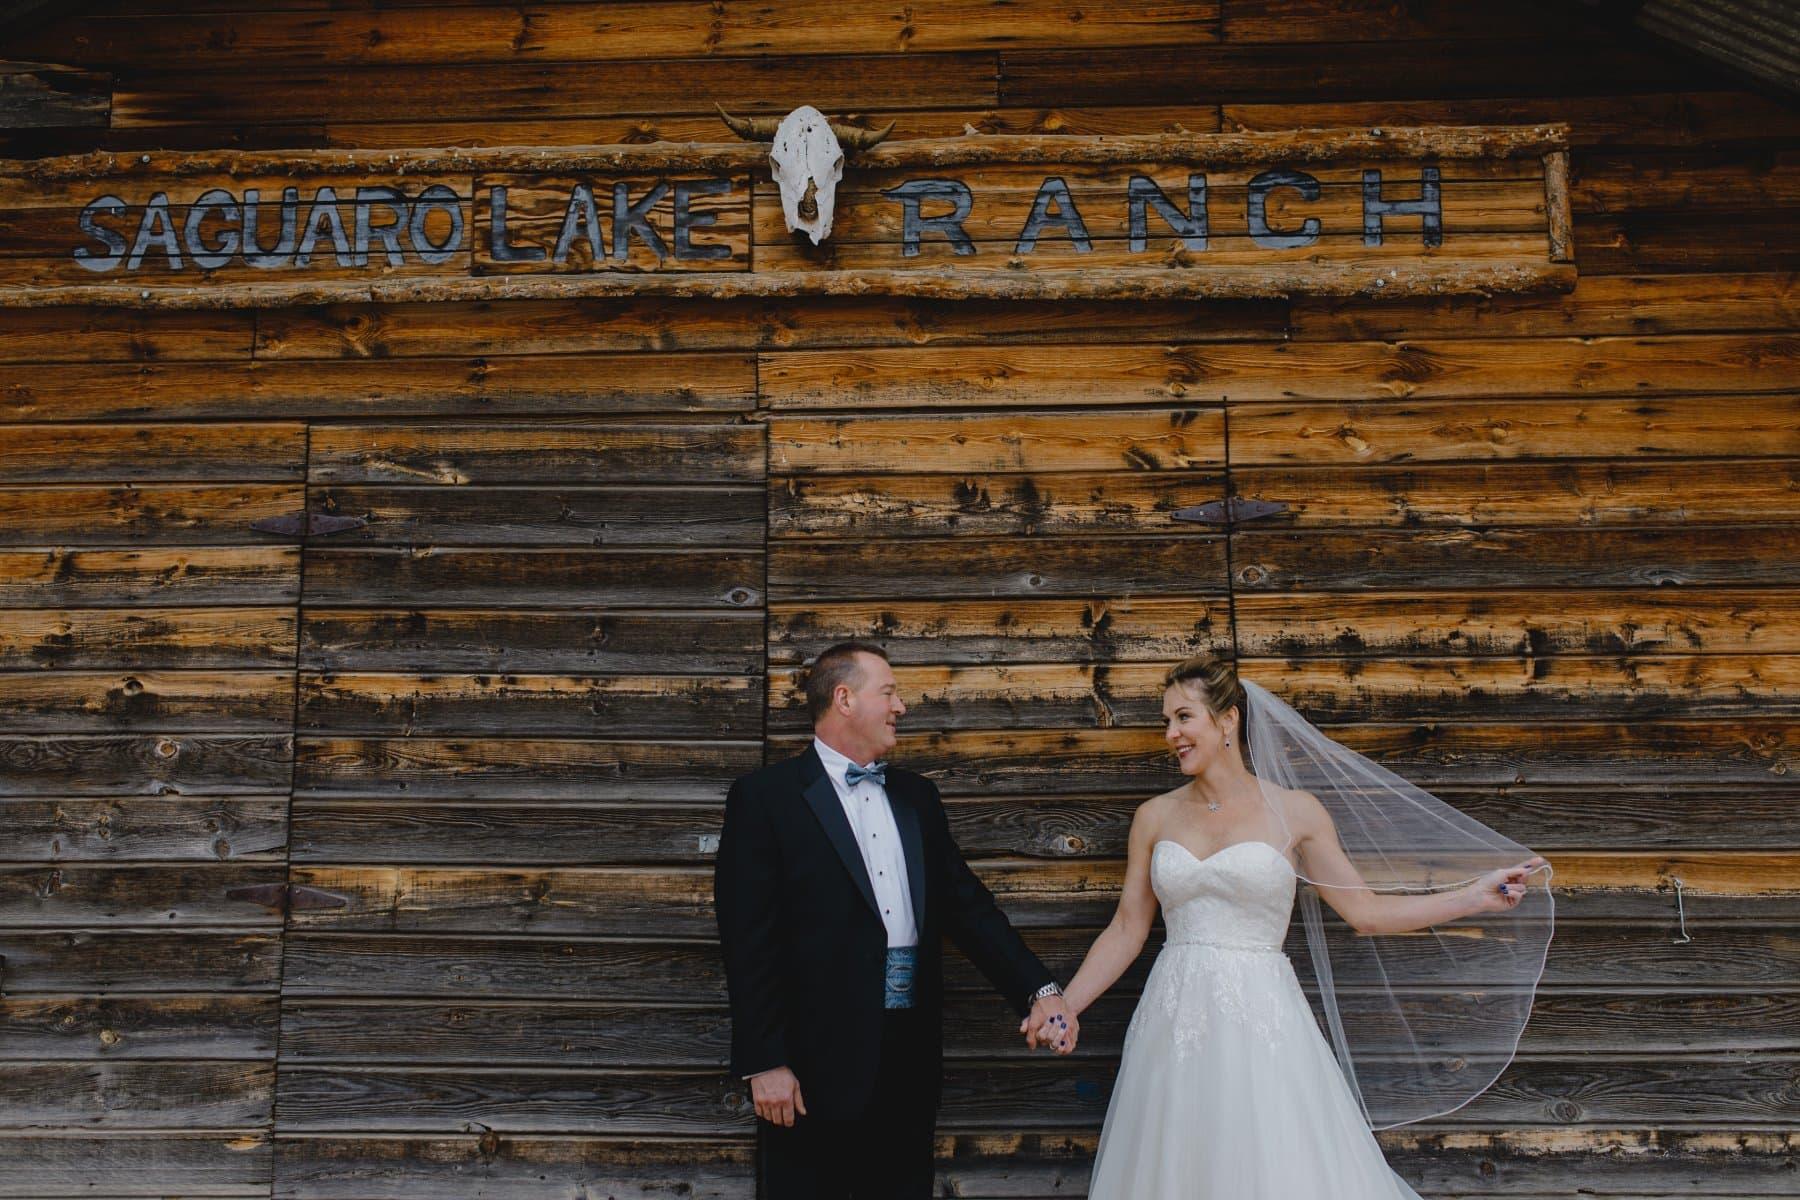 cute rustic wedding venue Saguaro Lake Ranch in Arizona